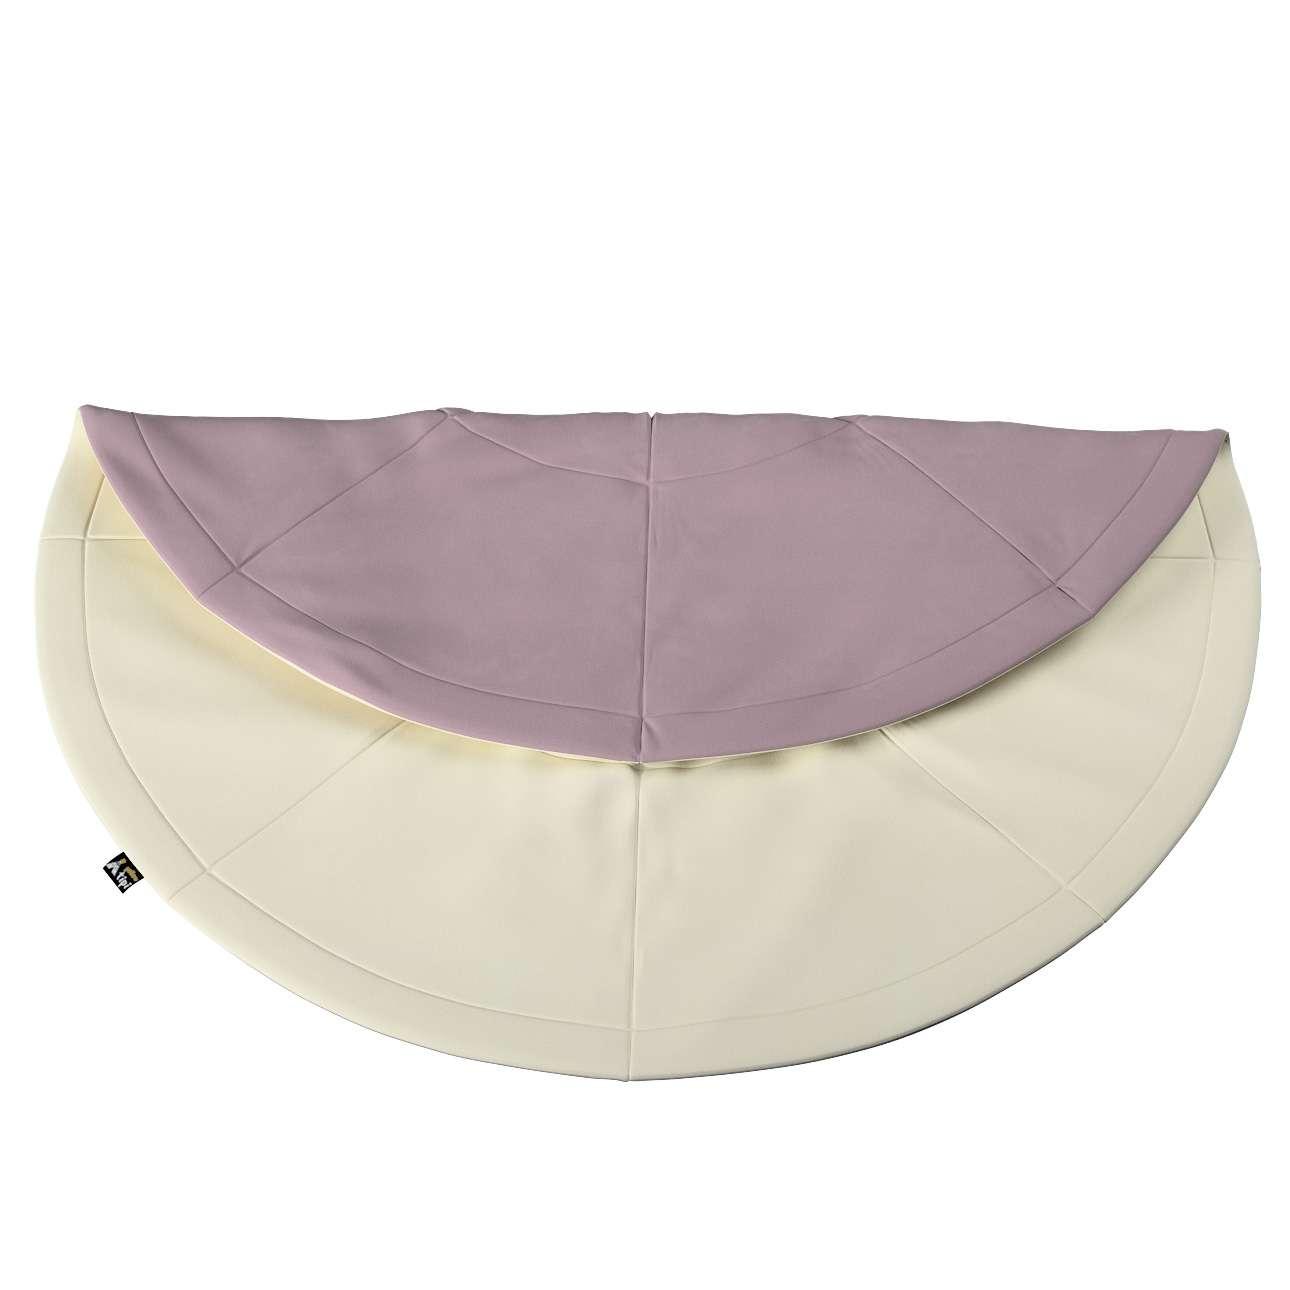 Round mat in collection Posh Velvet, fabric: 704-10